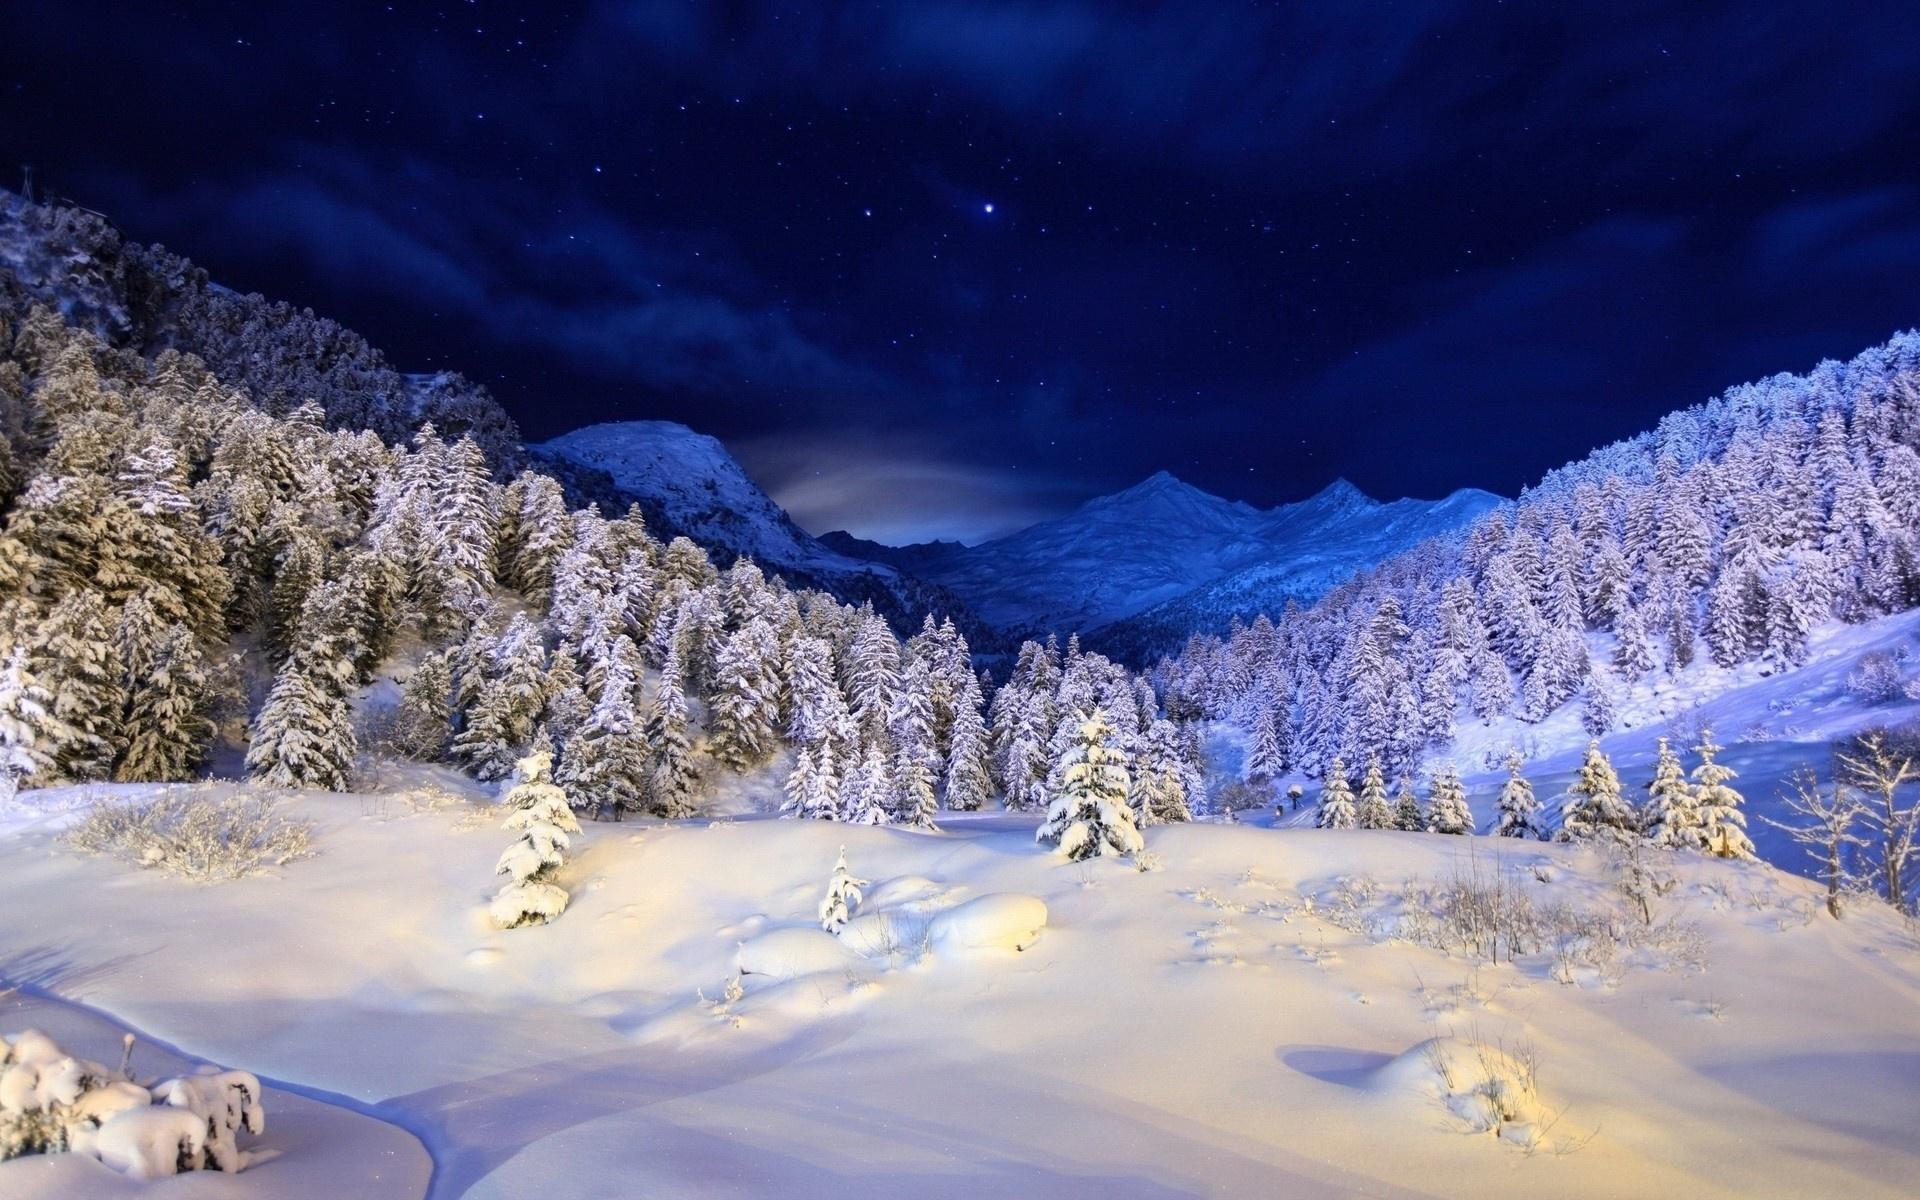 Картинки зима для компьютера